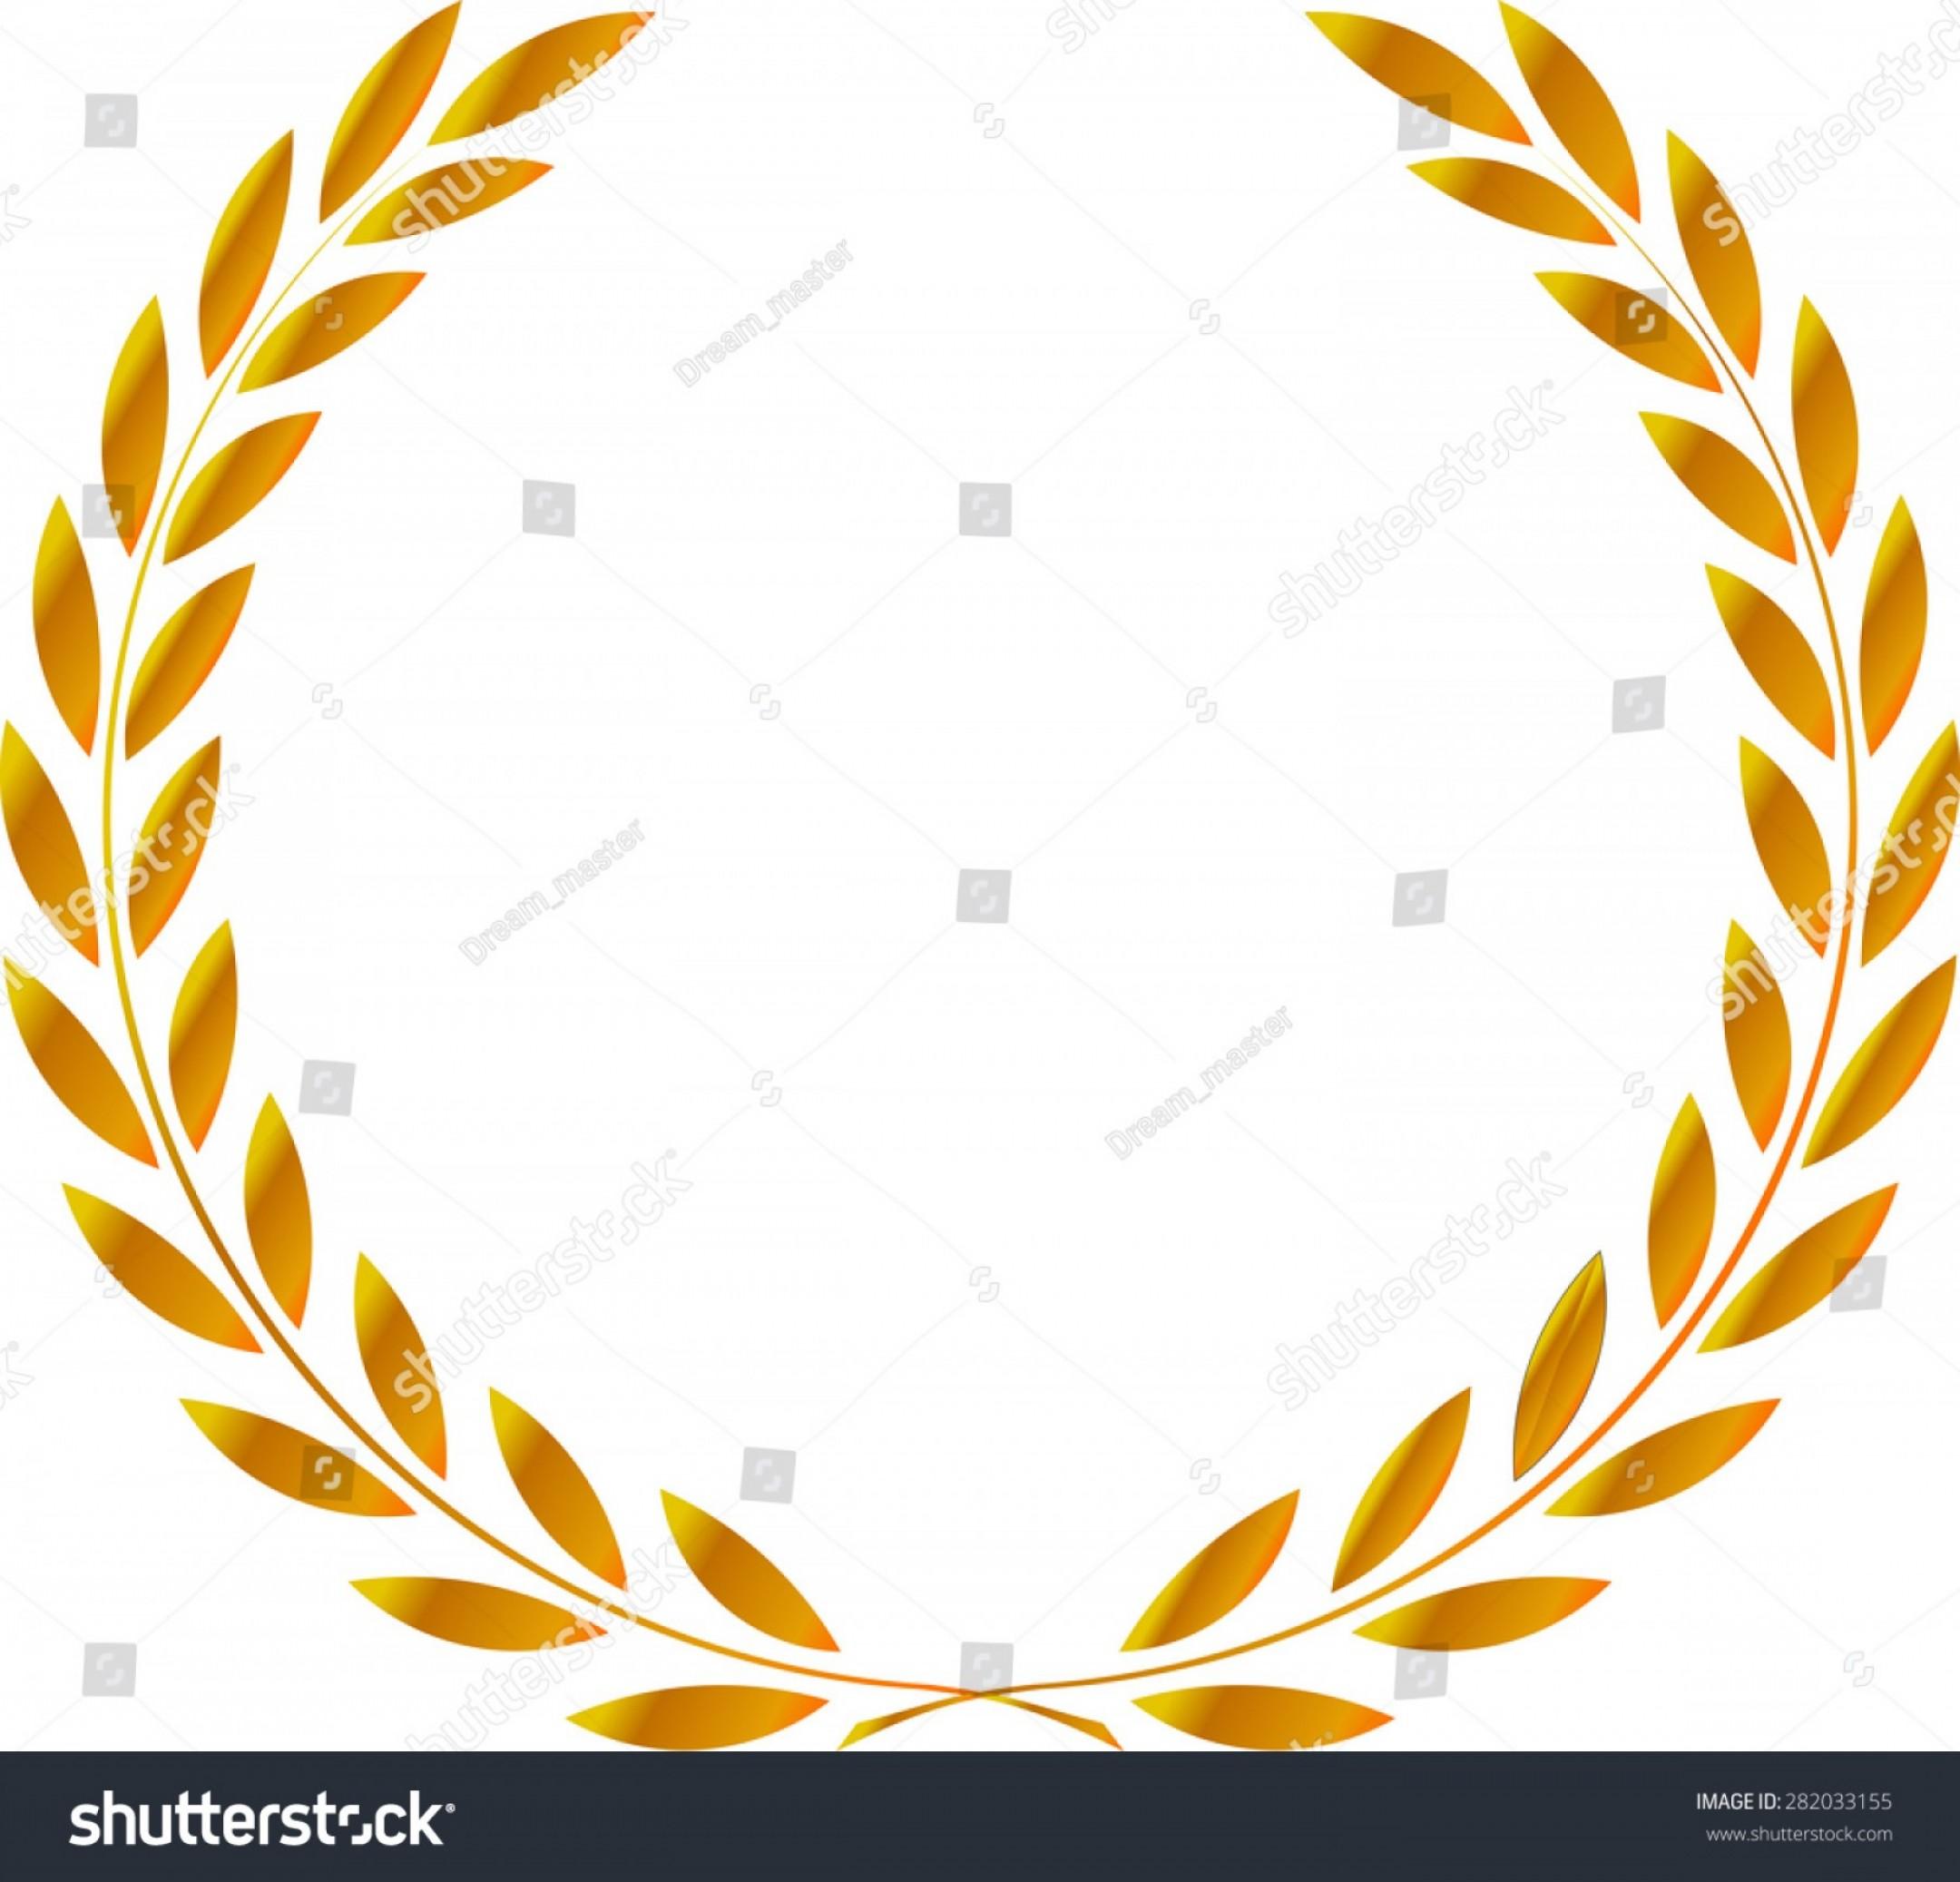 2160x2074 Icon Laurel Wreath Vector Illustration Gold Rongholland